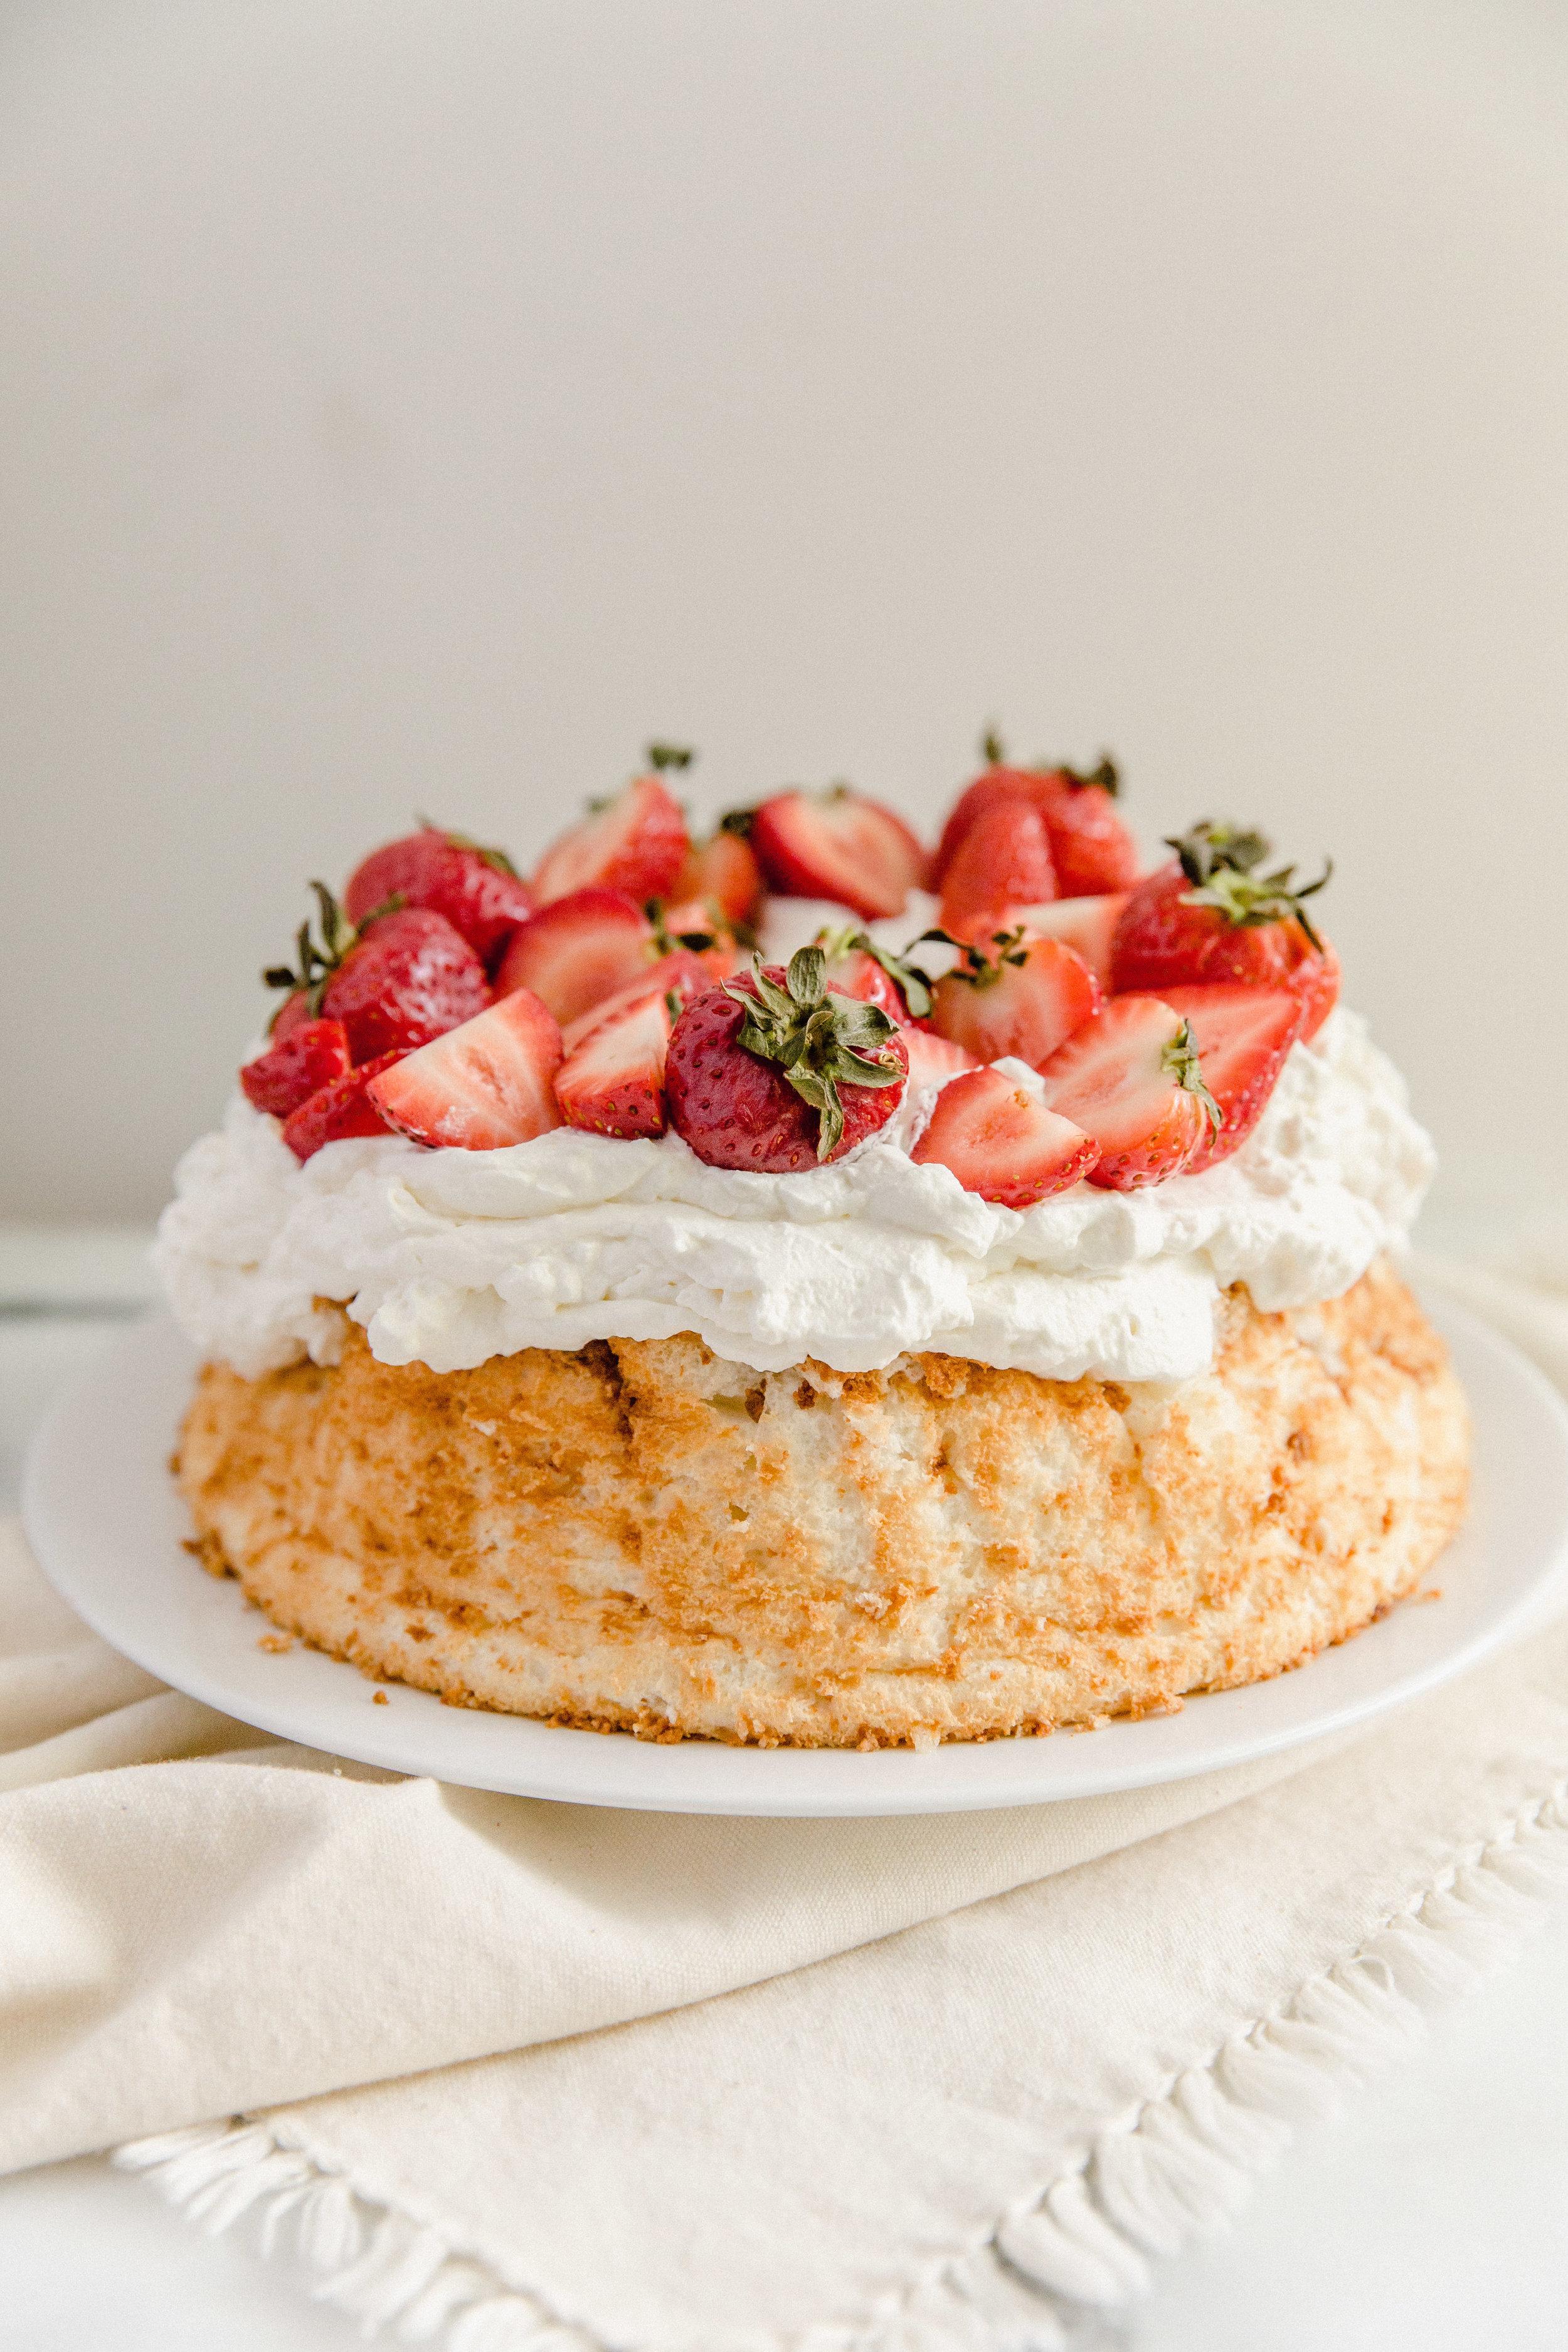 lemon-strawberry-shortcake-1.jpg